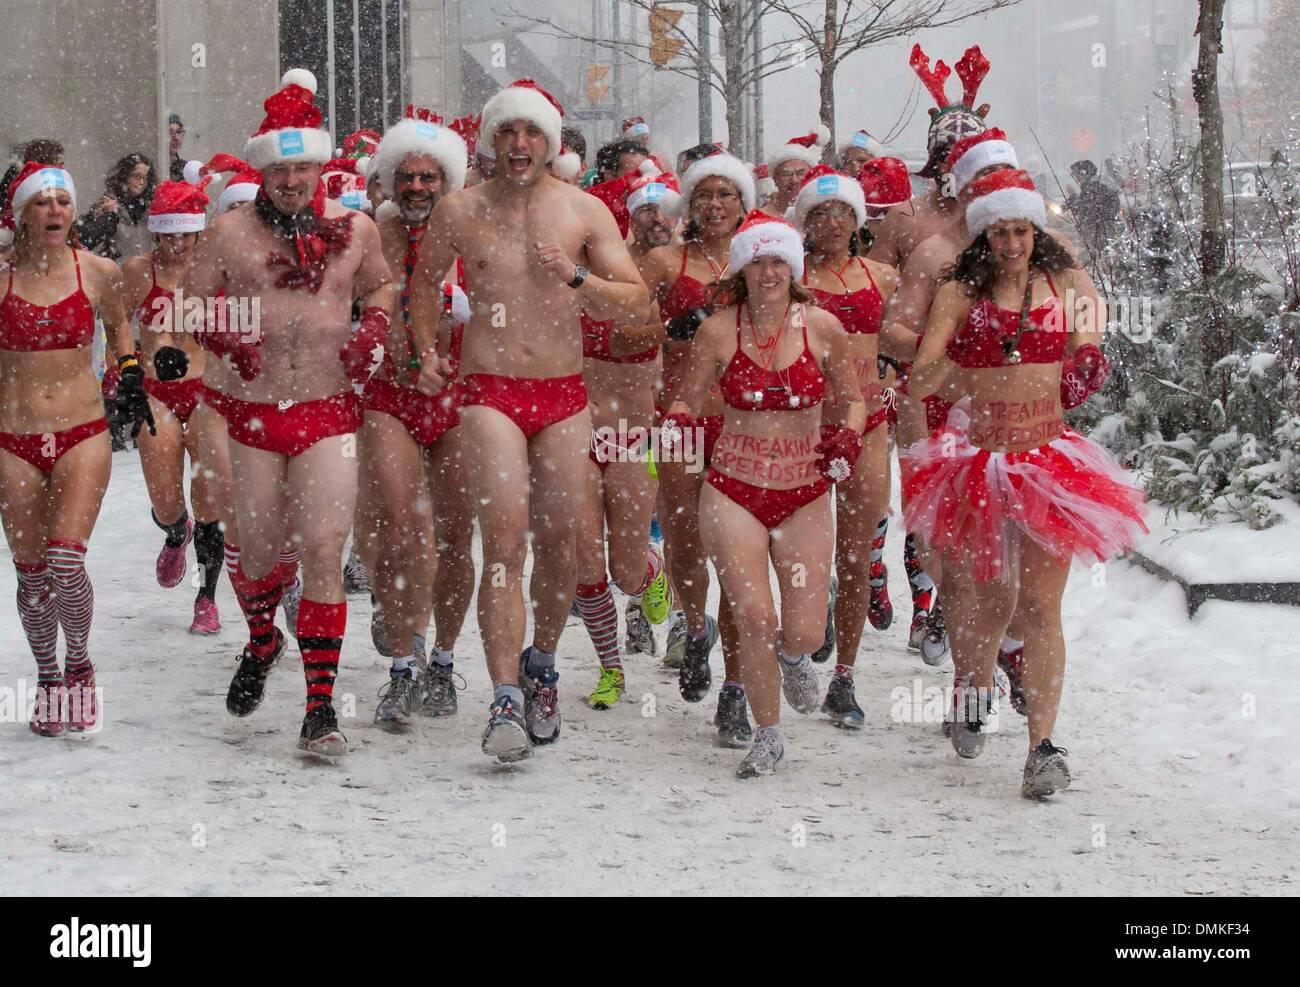 a03b1e8c40e57 14th Dec, 2013. Participants in bathing suits run during the 2013 Toronto  Santa Speedo Run in Toronto, Canada, Dec. 14, 2013.